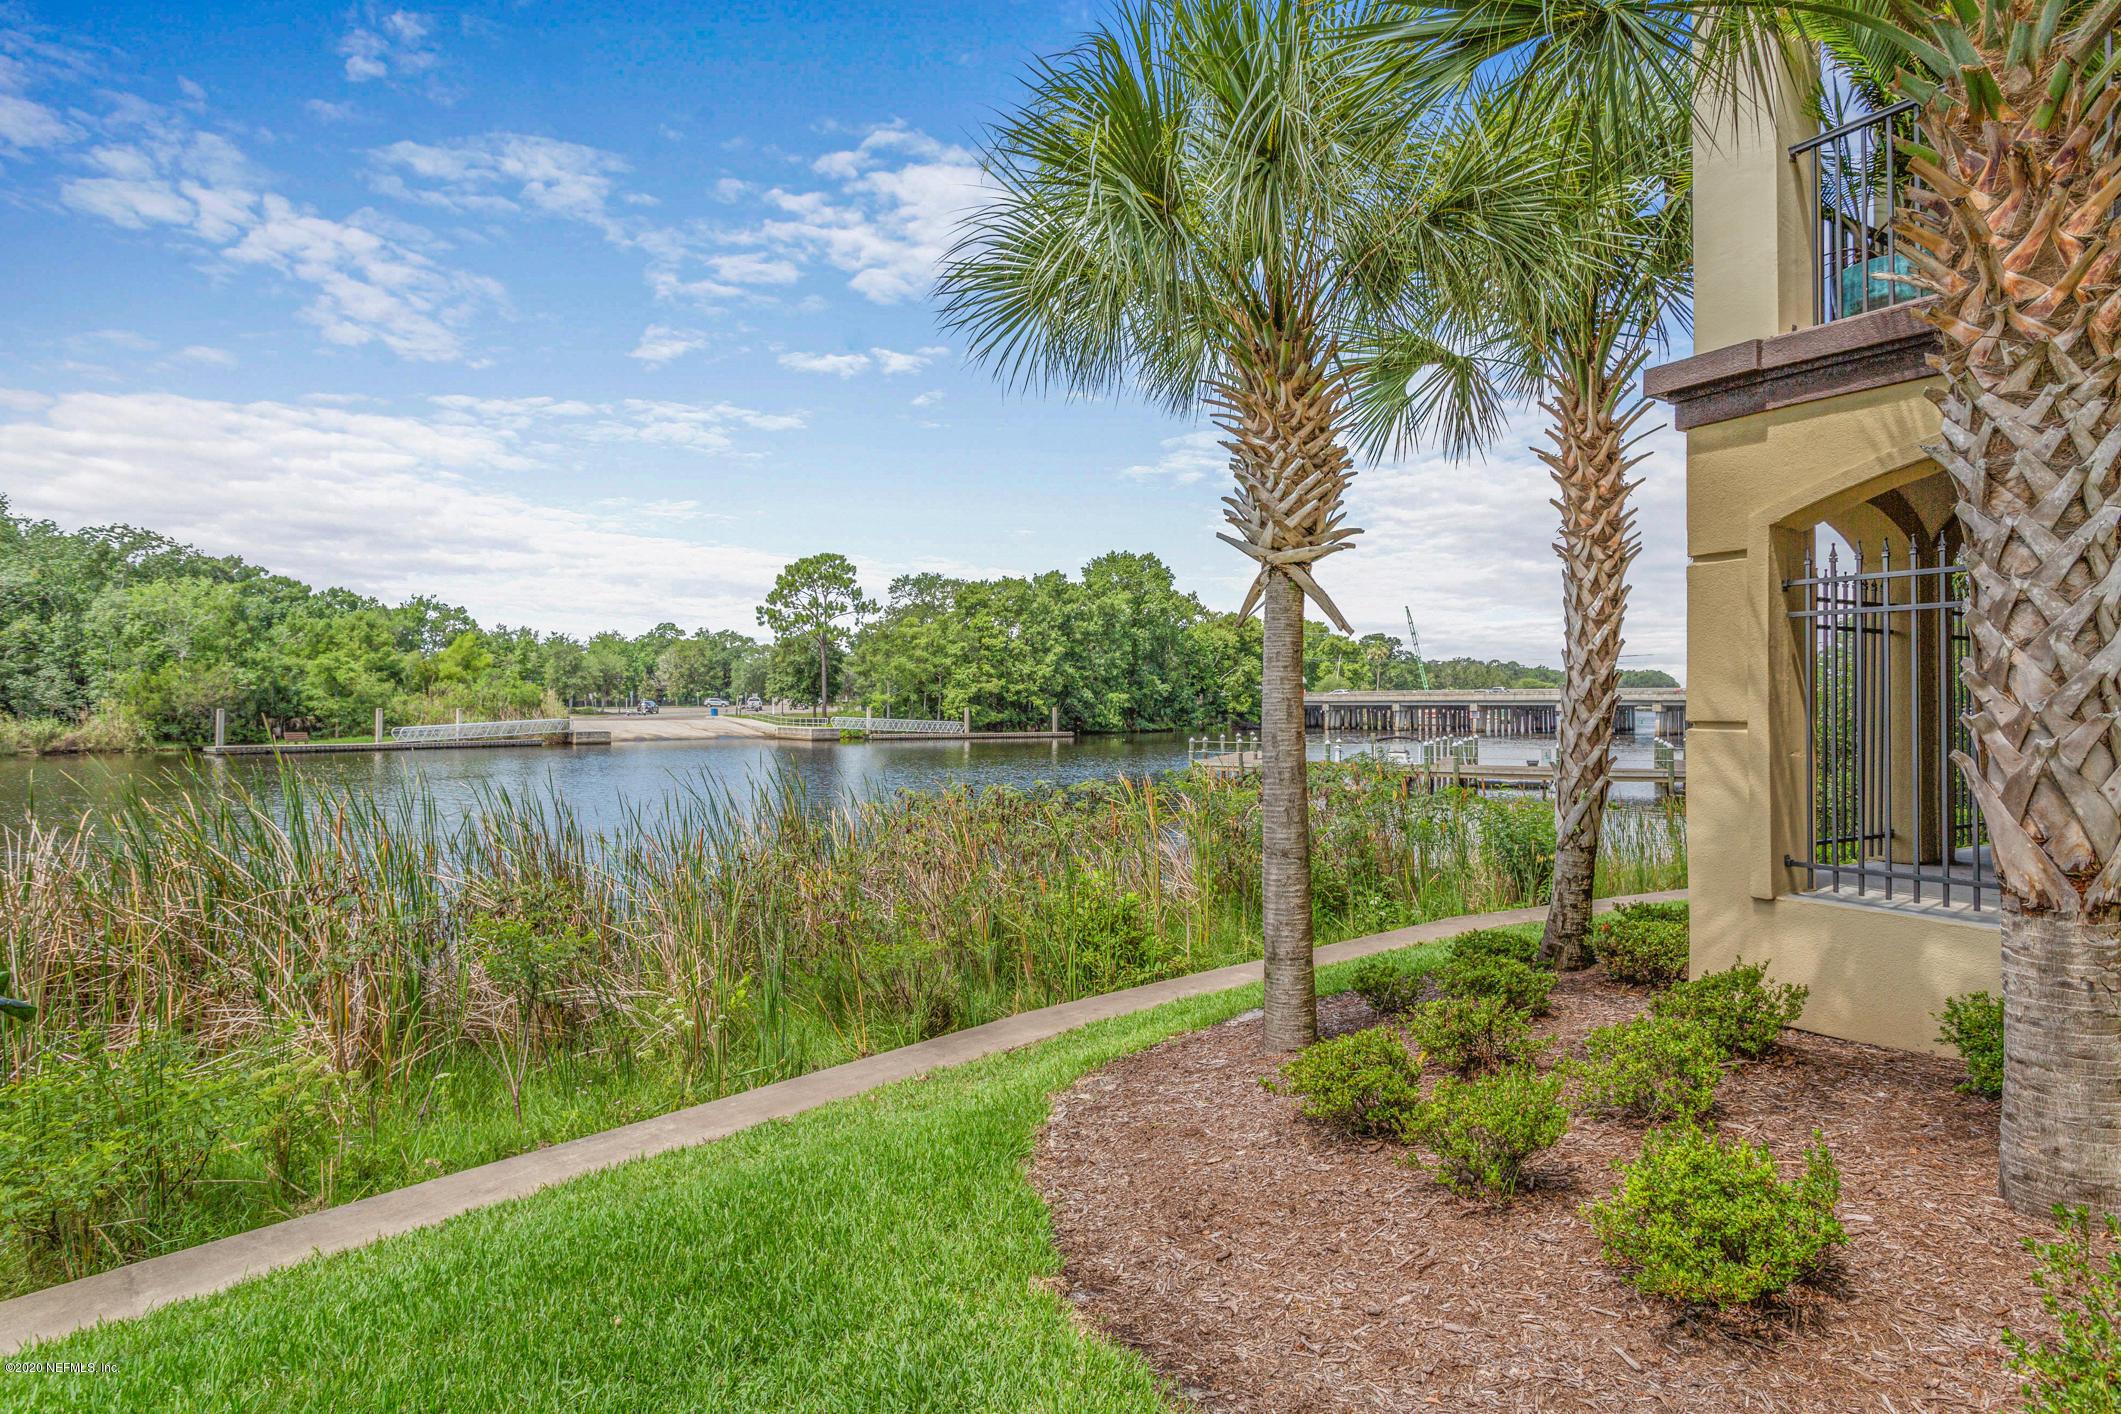 3958 BAYMEADOWS, JACKSONVILLE, FLORIDA 32217, 3 Bedrooms Bedrooms, ,2 BathroomsBathrooms,Residential,For sale,BAYMEADOWS,1058609